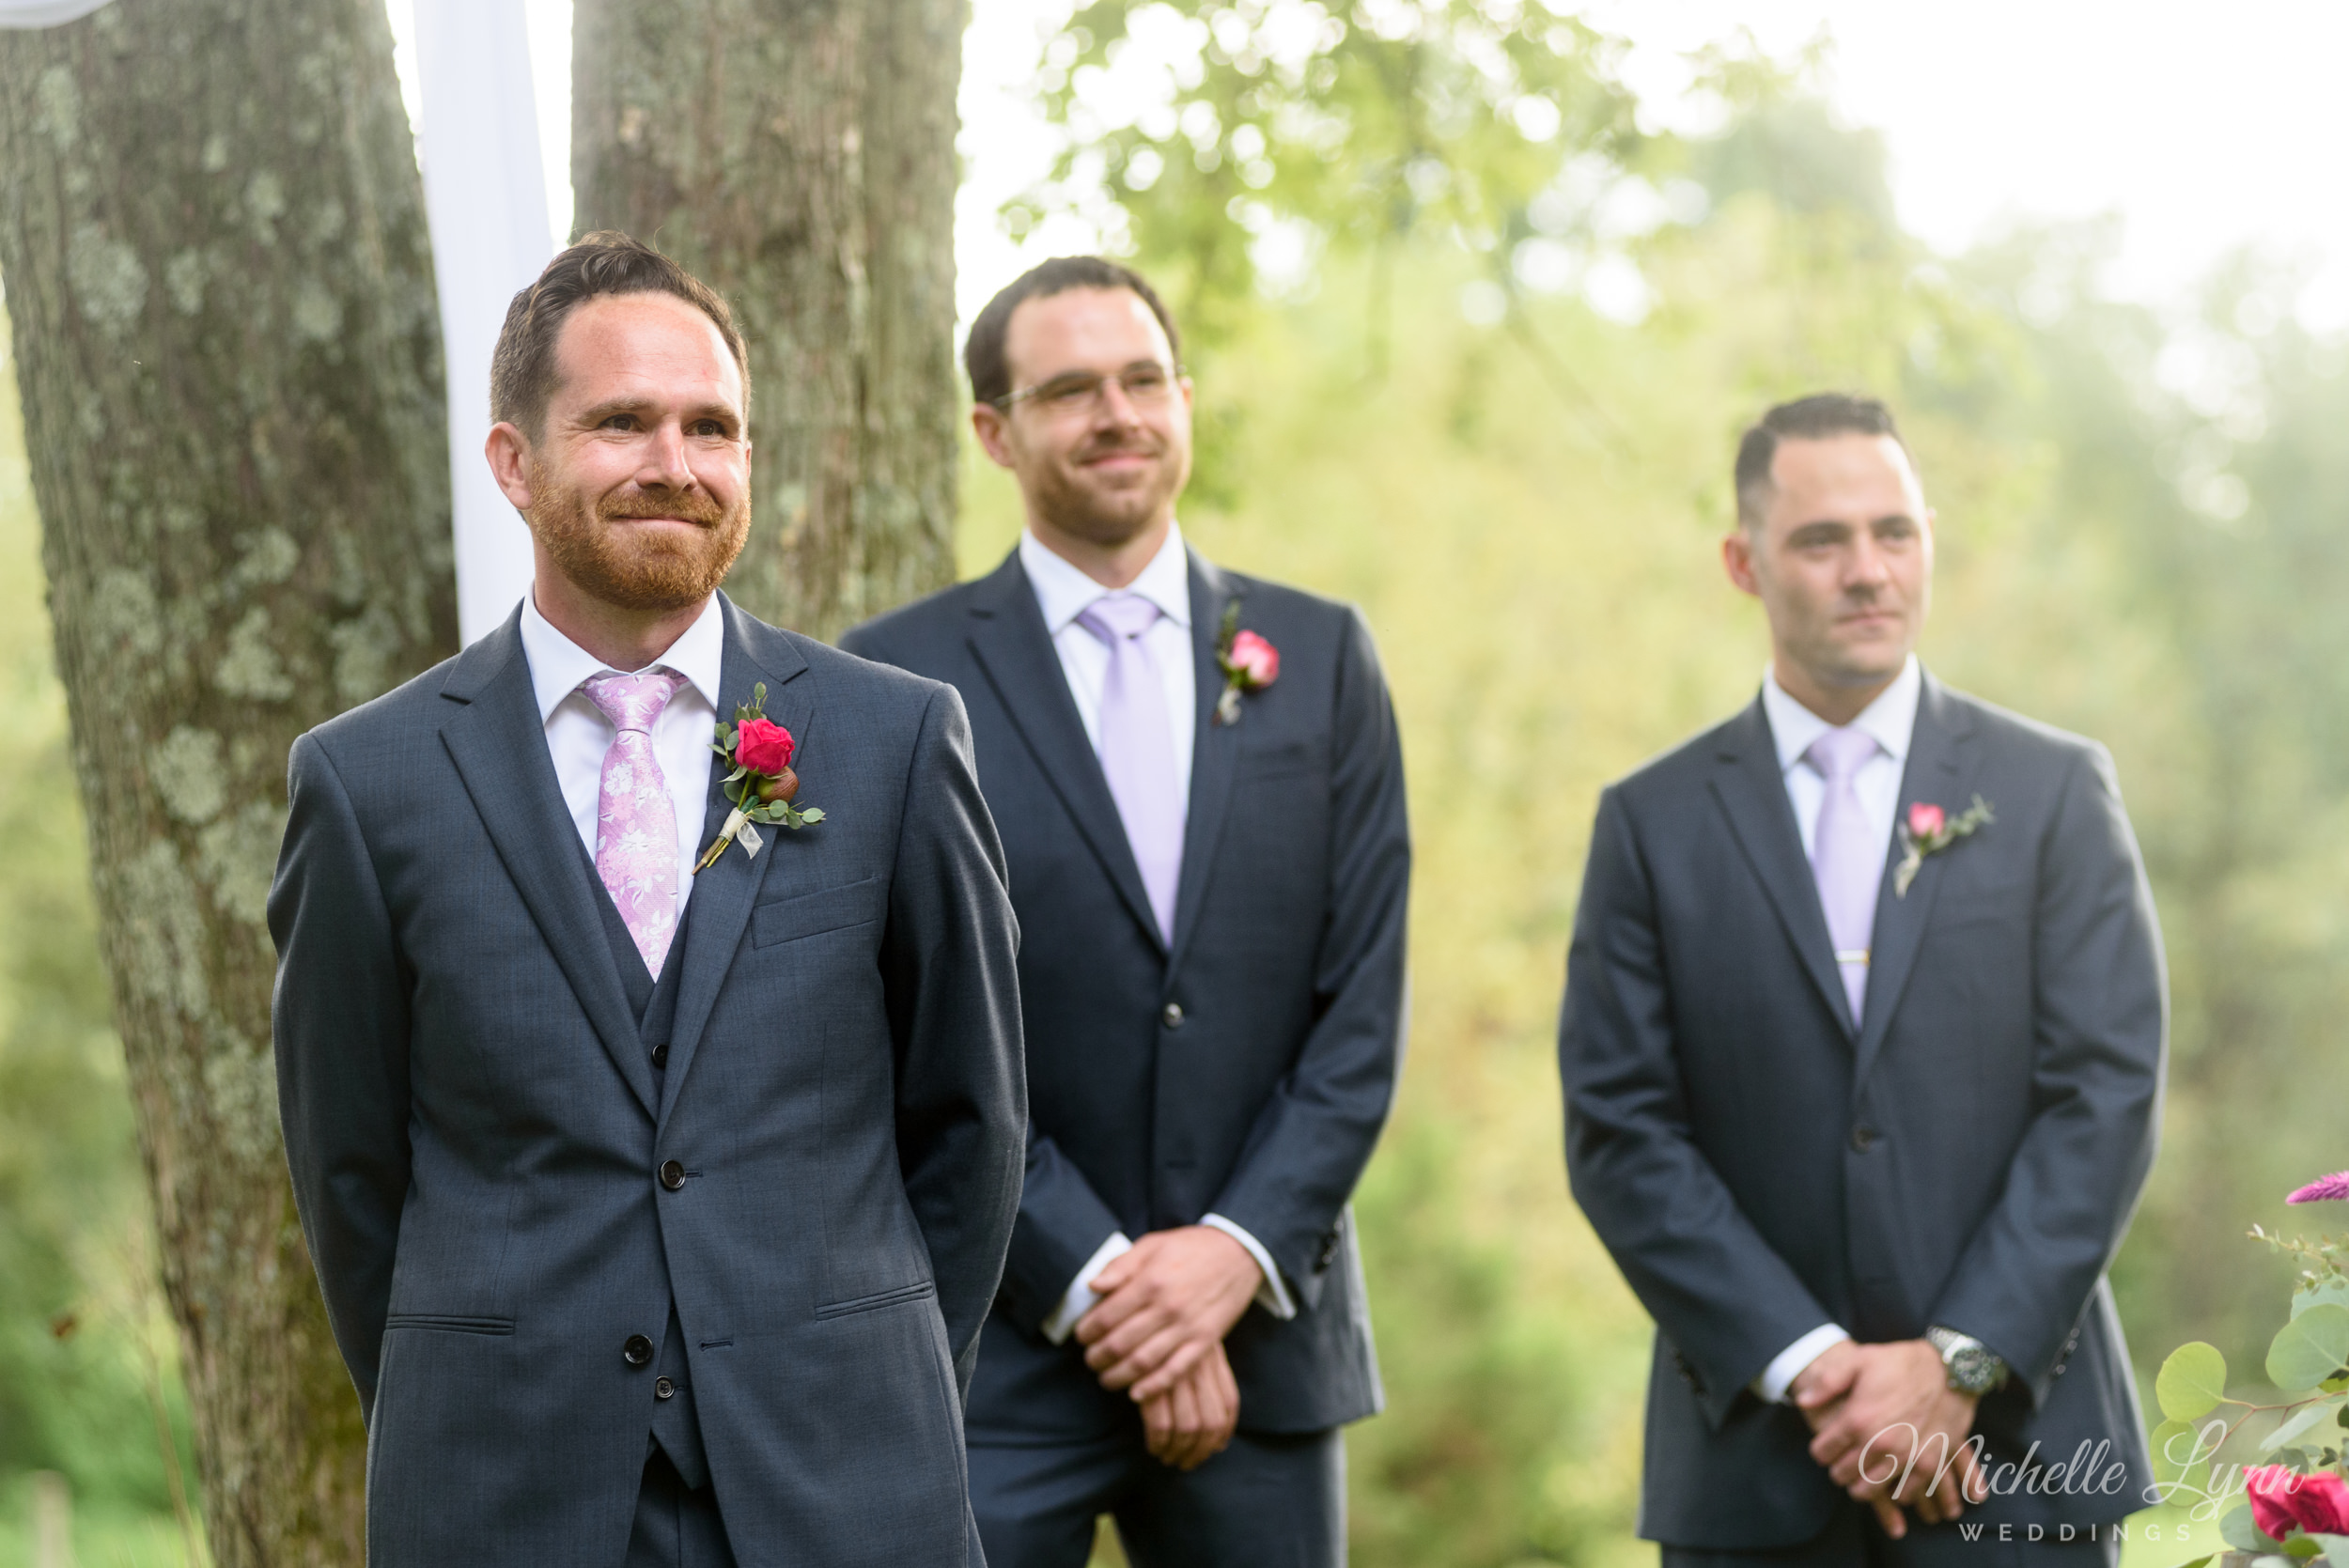 mlw-unionville-vineyards-nj-wedding-photography-33.jpg